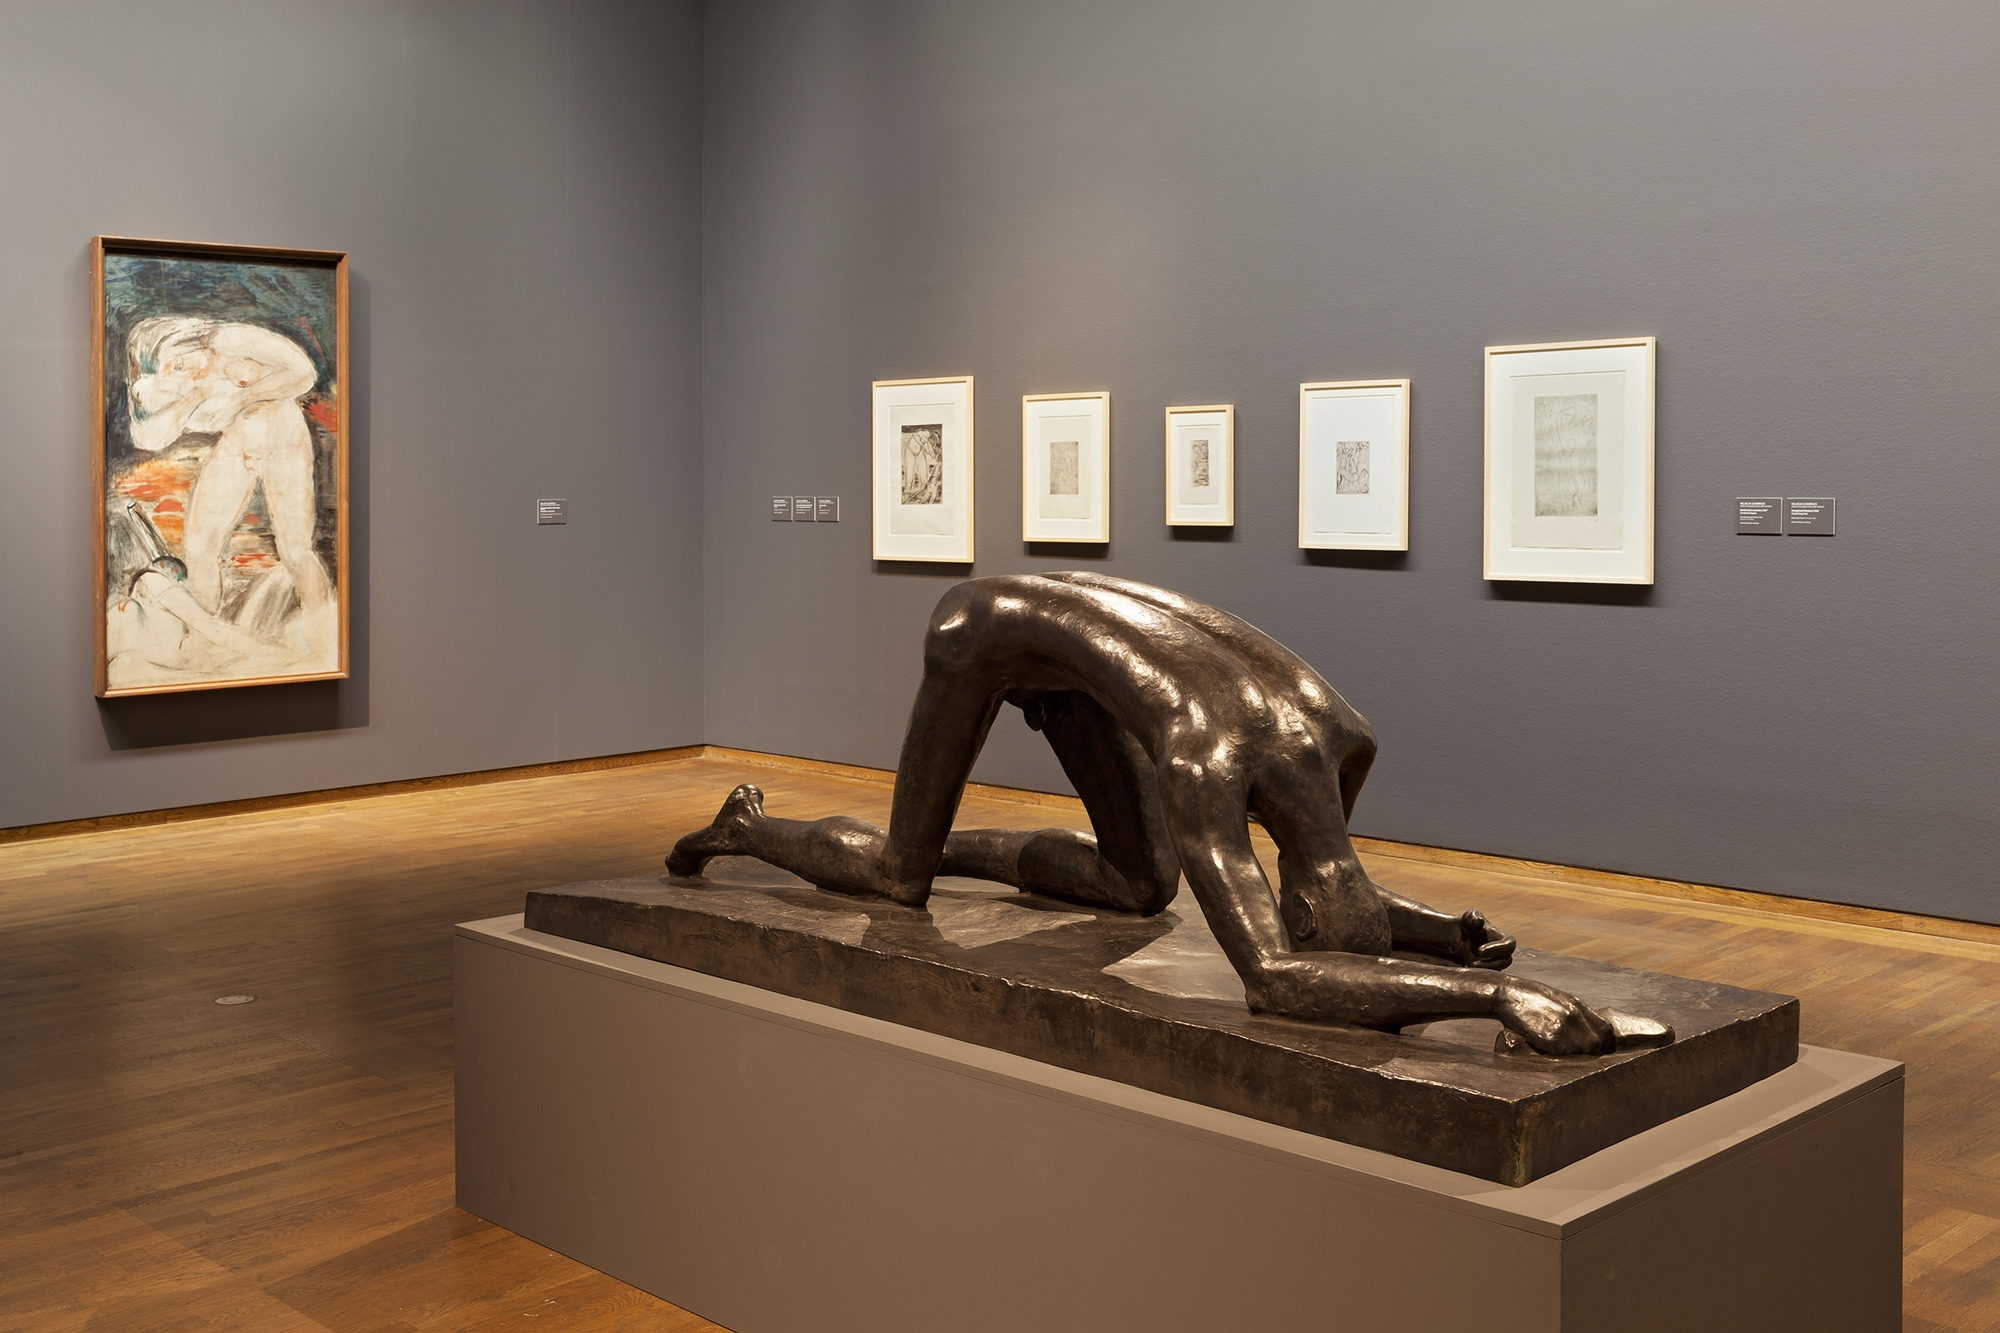 Ausstellungsansicht Leopold Museum Wien - Wilhelm Lehmbruck. Retrospektive © Foto Lisa Rastl, 2016